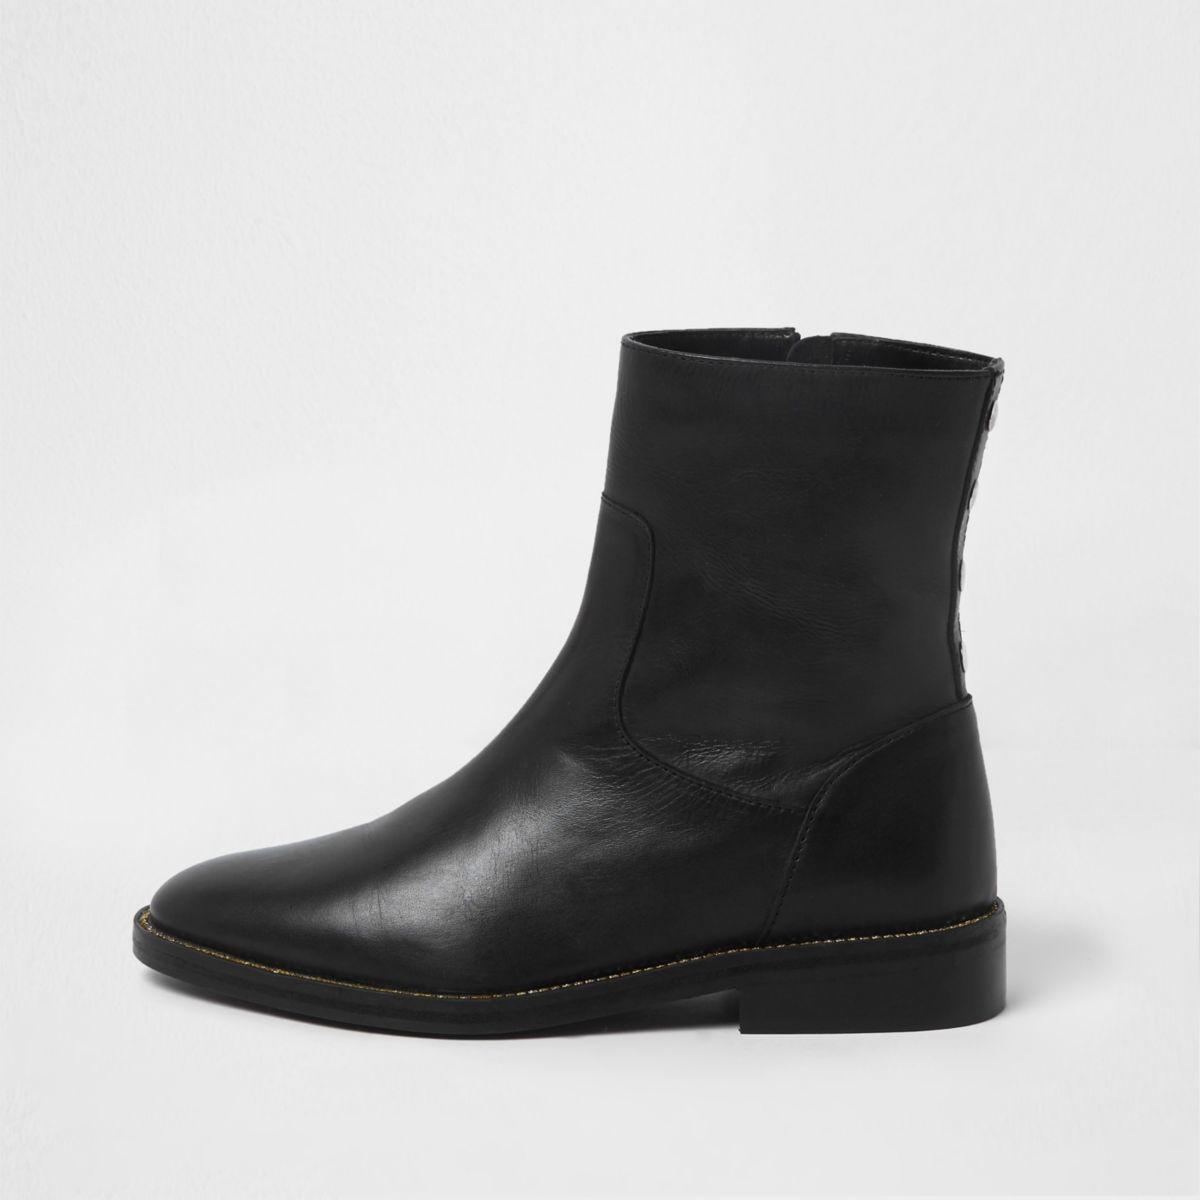 Black leather rhinestone trim ankle boots